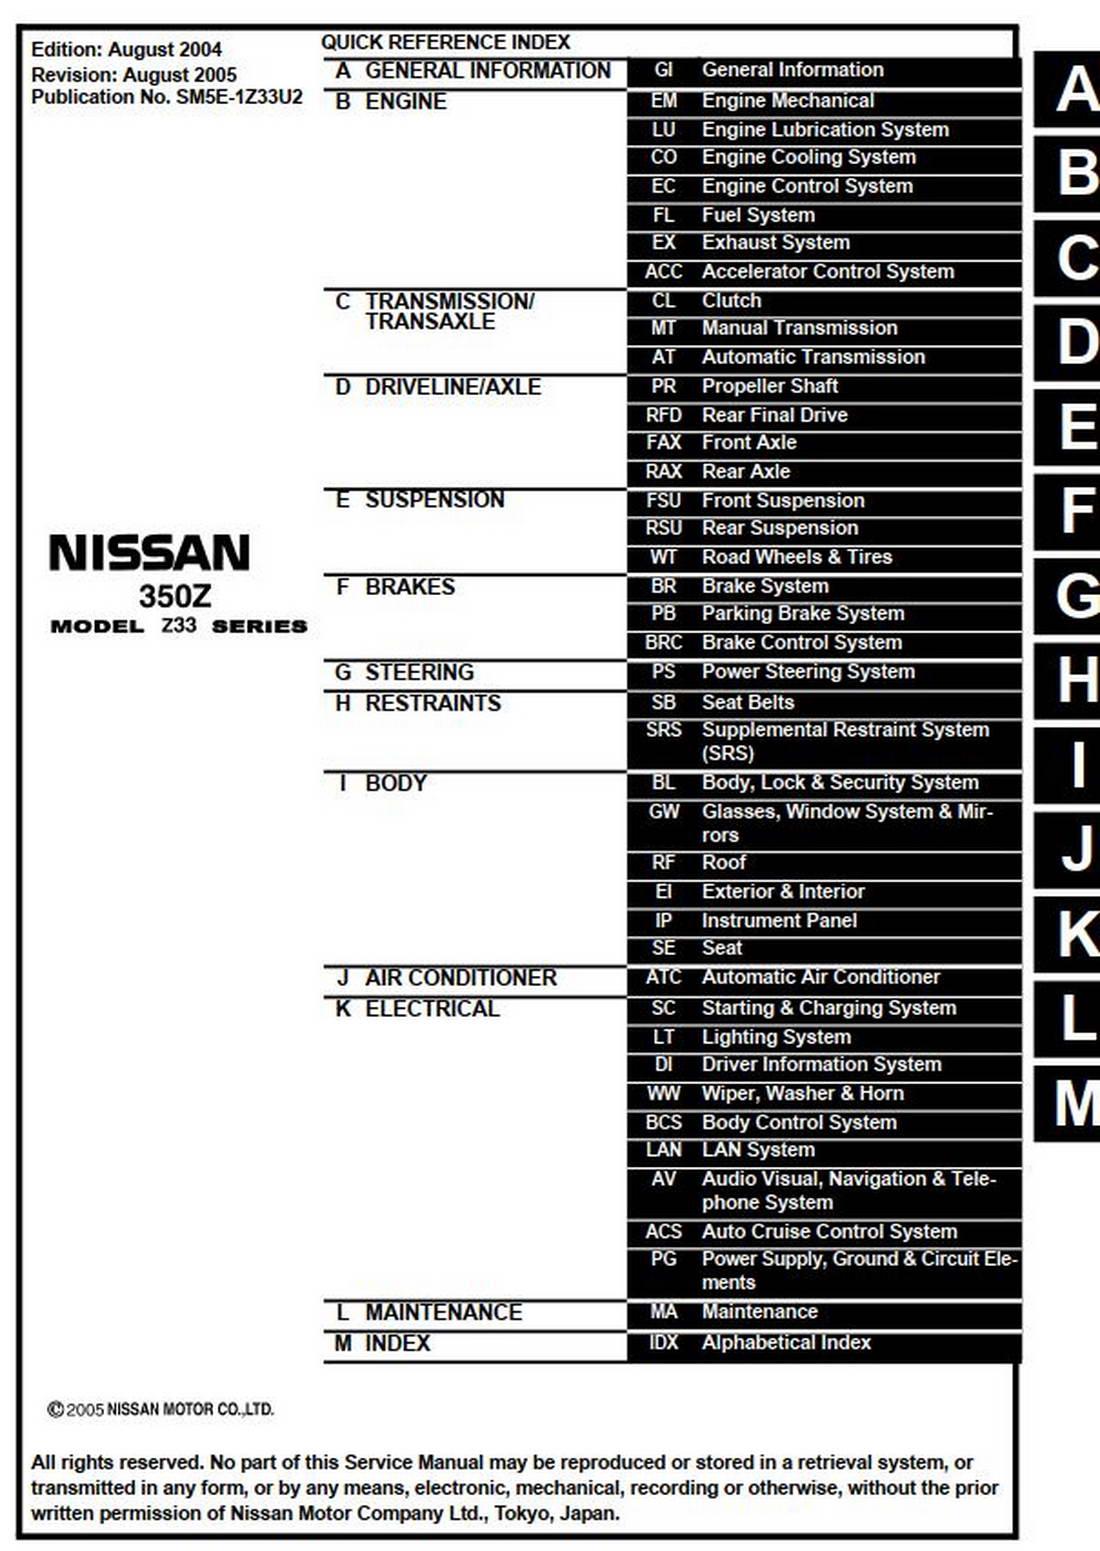 NISSAN 350Z MODEL Z33 SERIES 2005 SERVICE MANUAL (SM5E